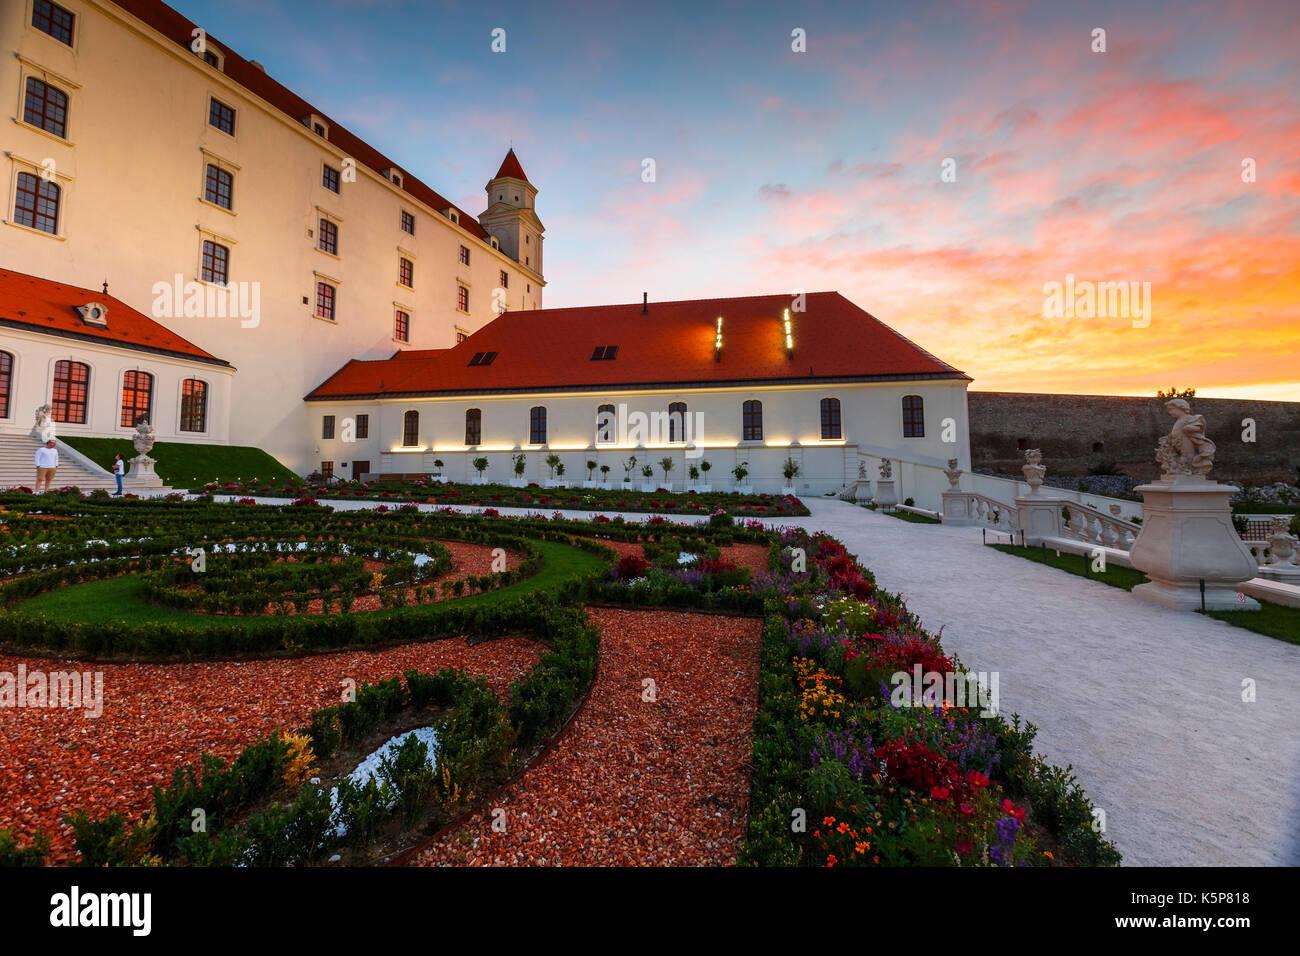 Reconstructed historical baroque garden in Bratislava castle complex, Slovakia. - Stock Image